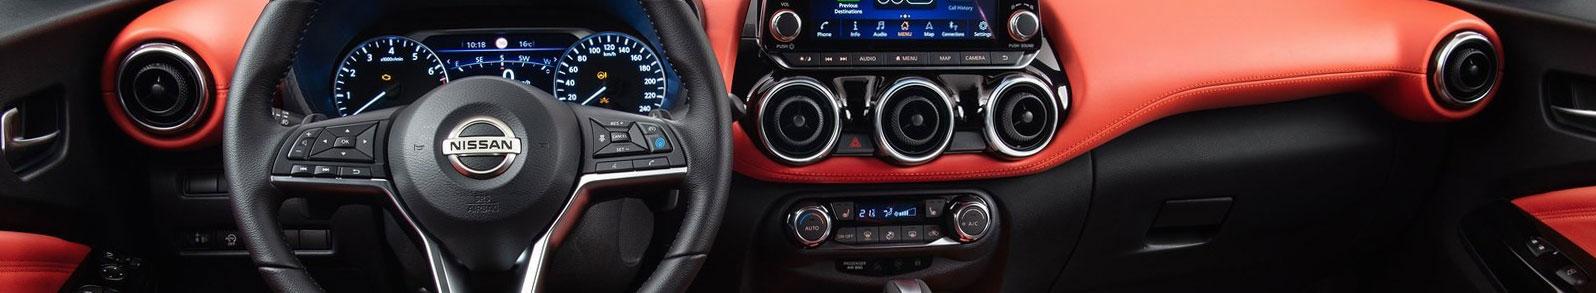 Nissan Juke neuve - prix mandataire dès 20994 € - jusqu'à ...